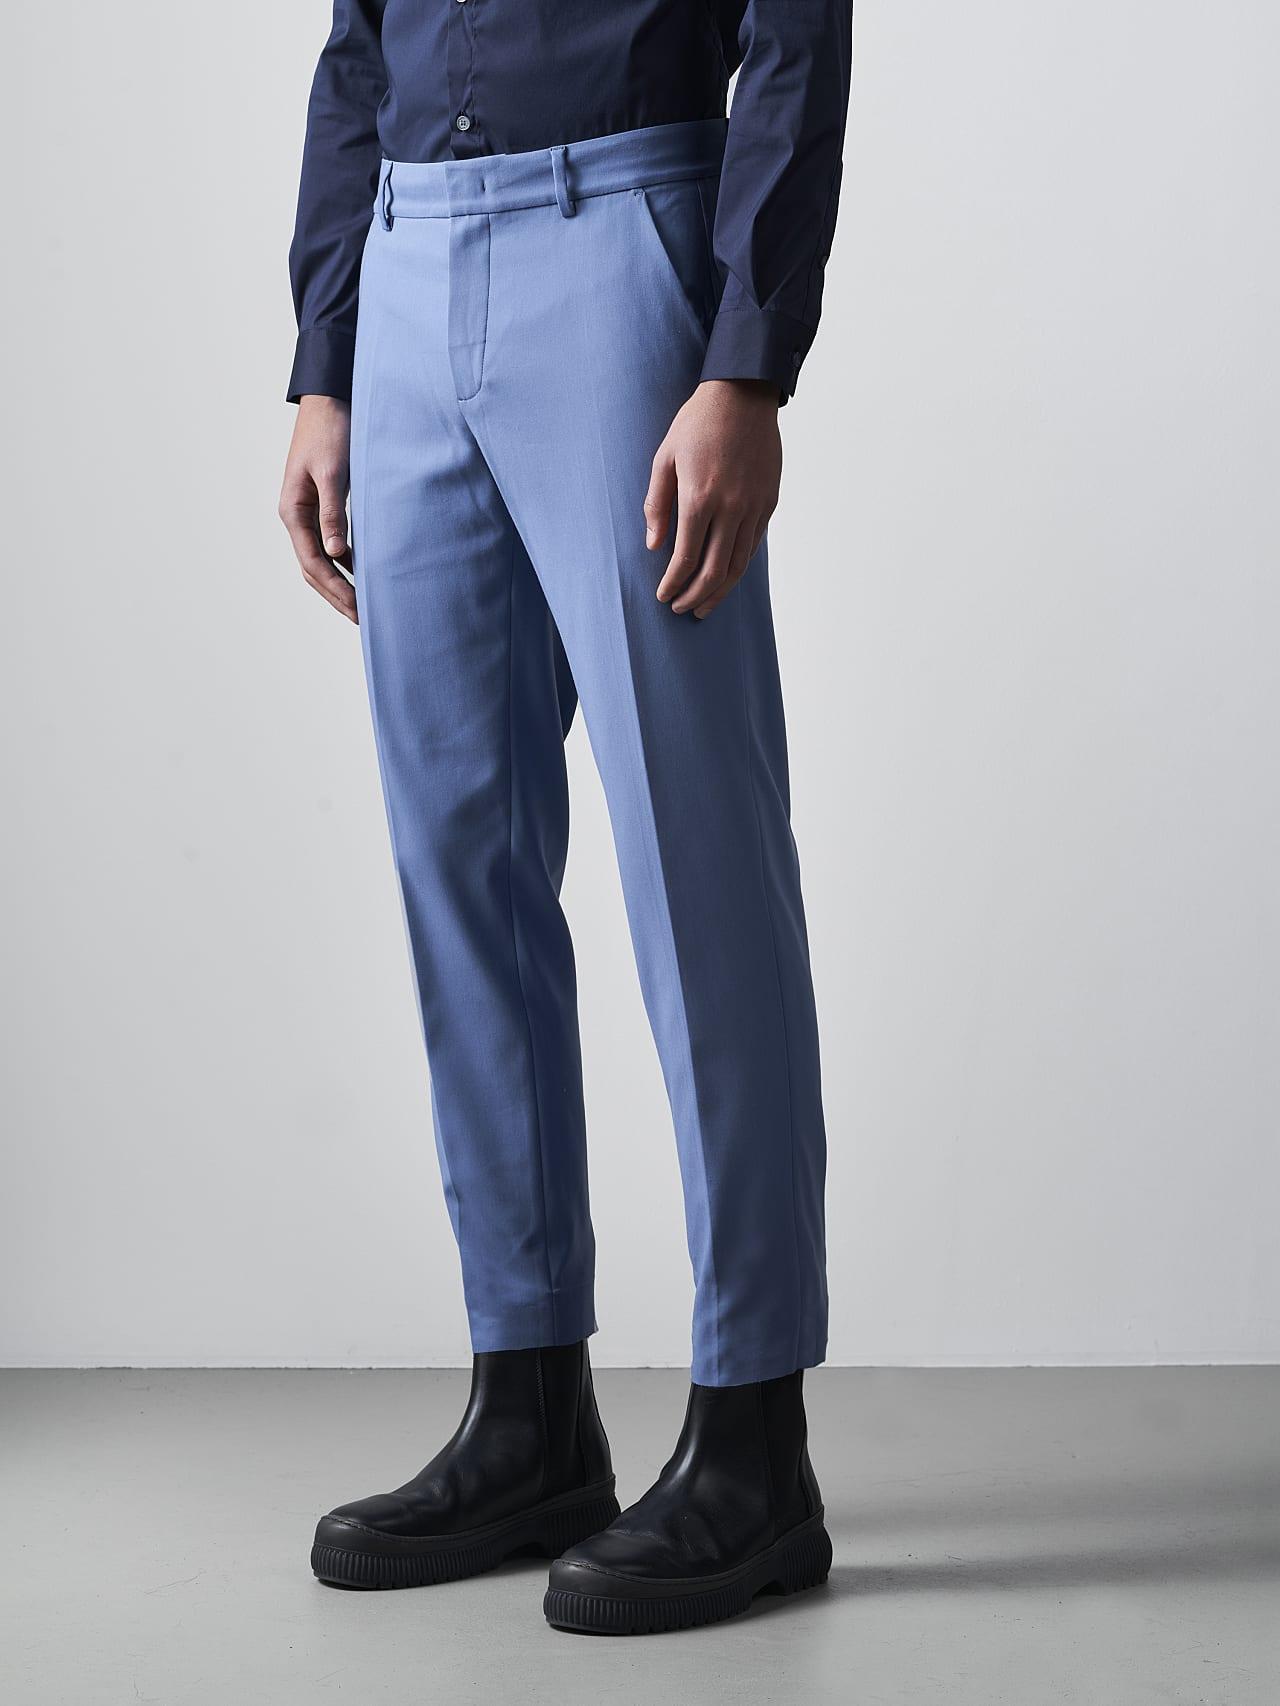 PELAN V1.Y5.02 Tapered Pants with Pleats light blue Model shot Alpha Tauri